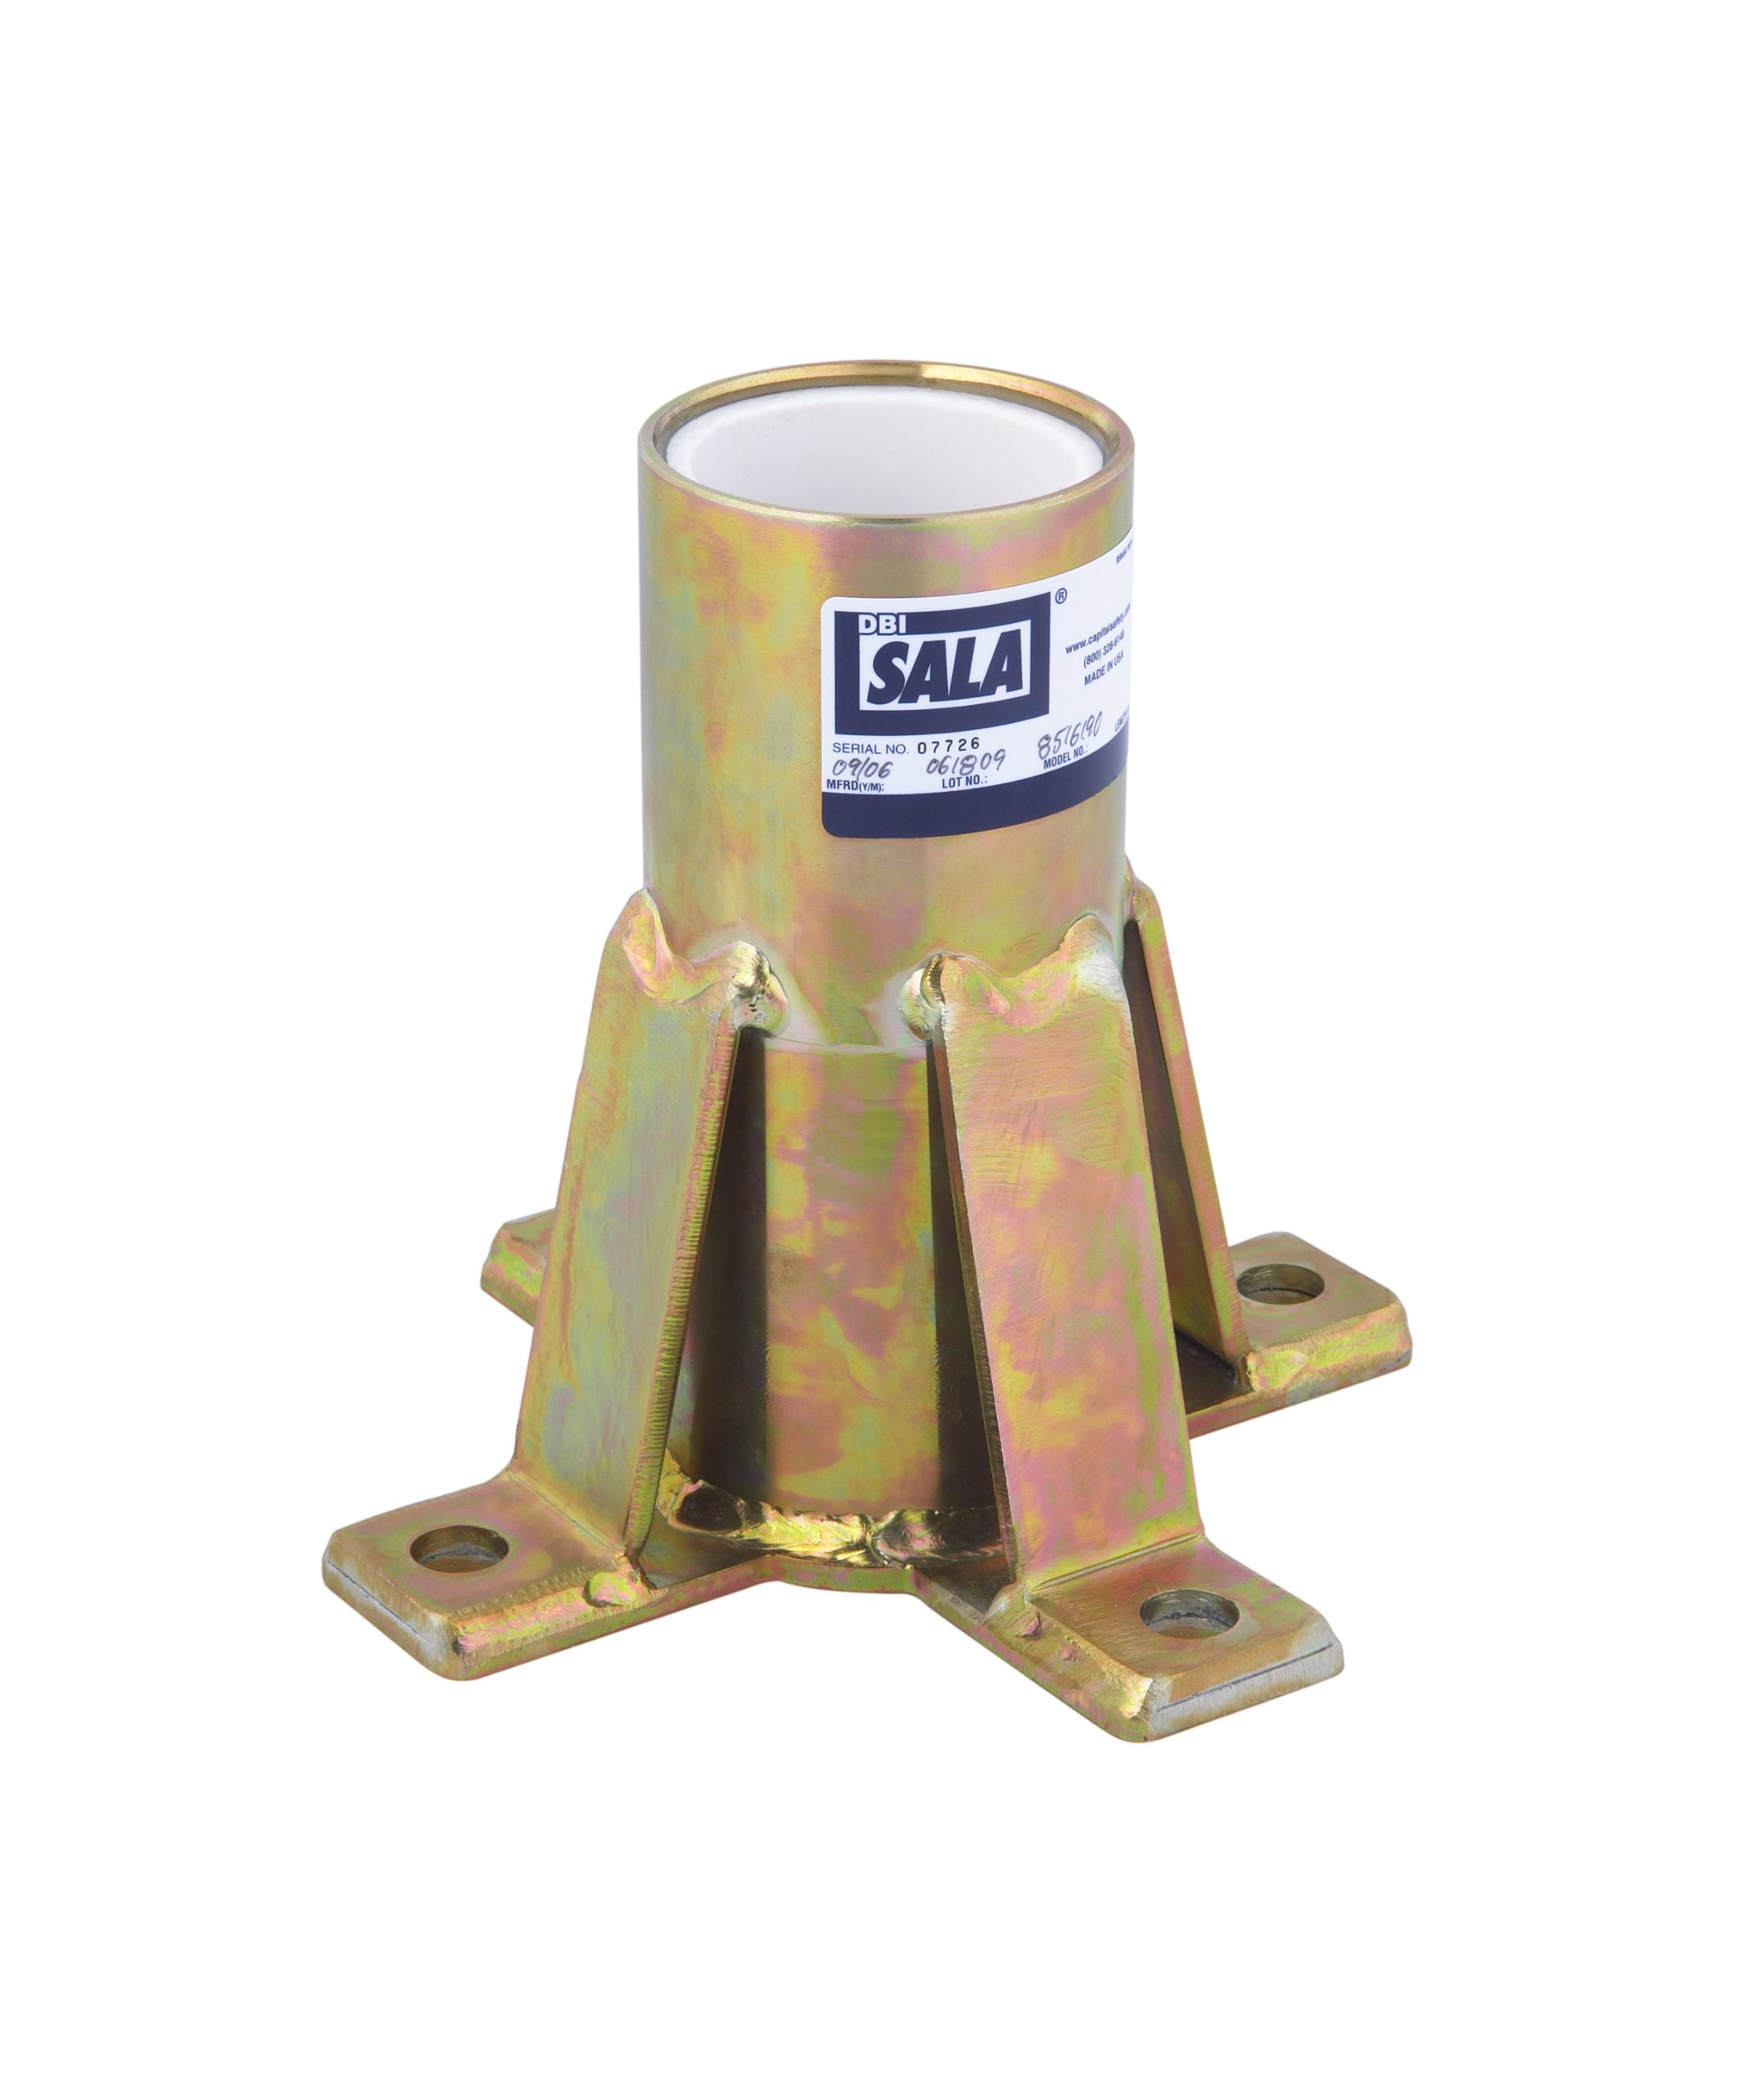 3M DBI-SALA Advanced 8516190 Confined Space System, Floor Mount Sleeve Davit Base, Zinc Plated, for Advanced Offset Davit Mast, Yellow Zinc